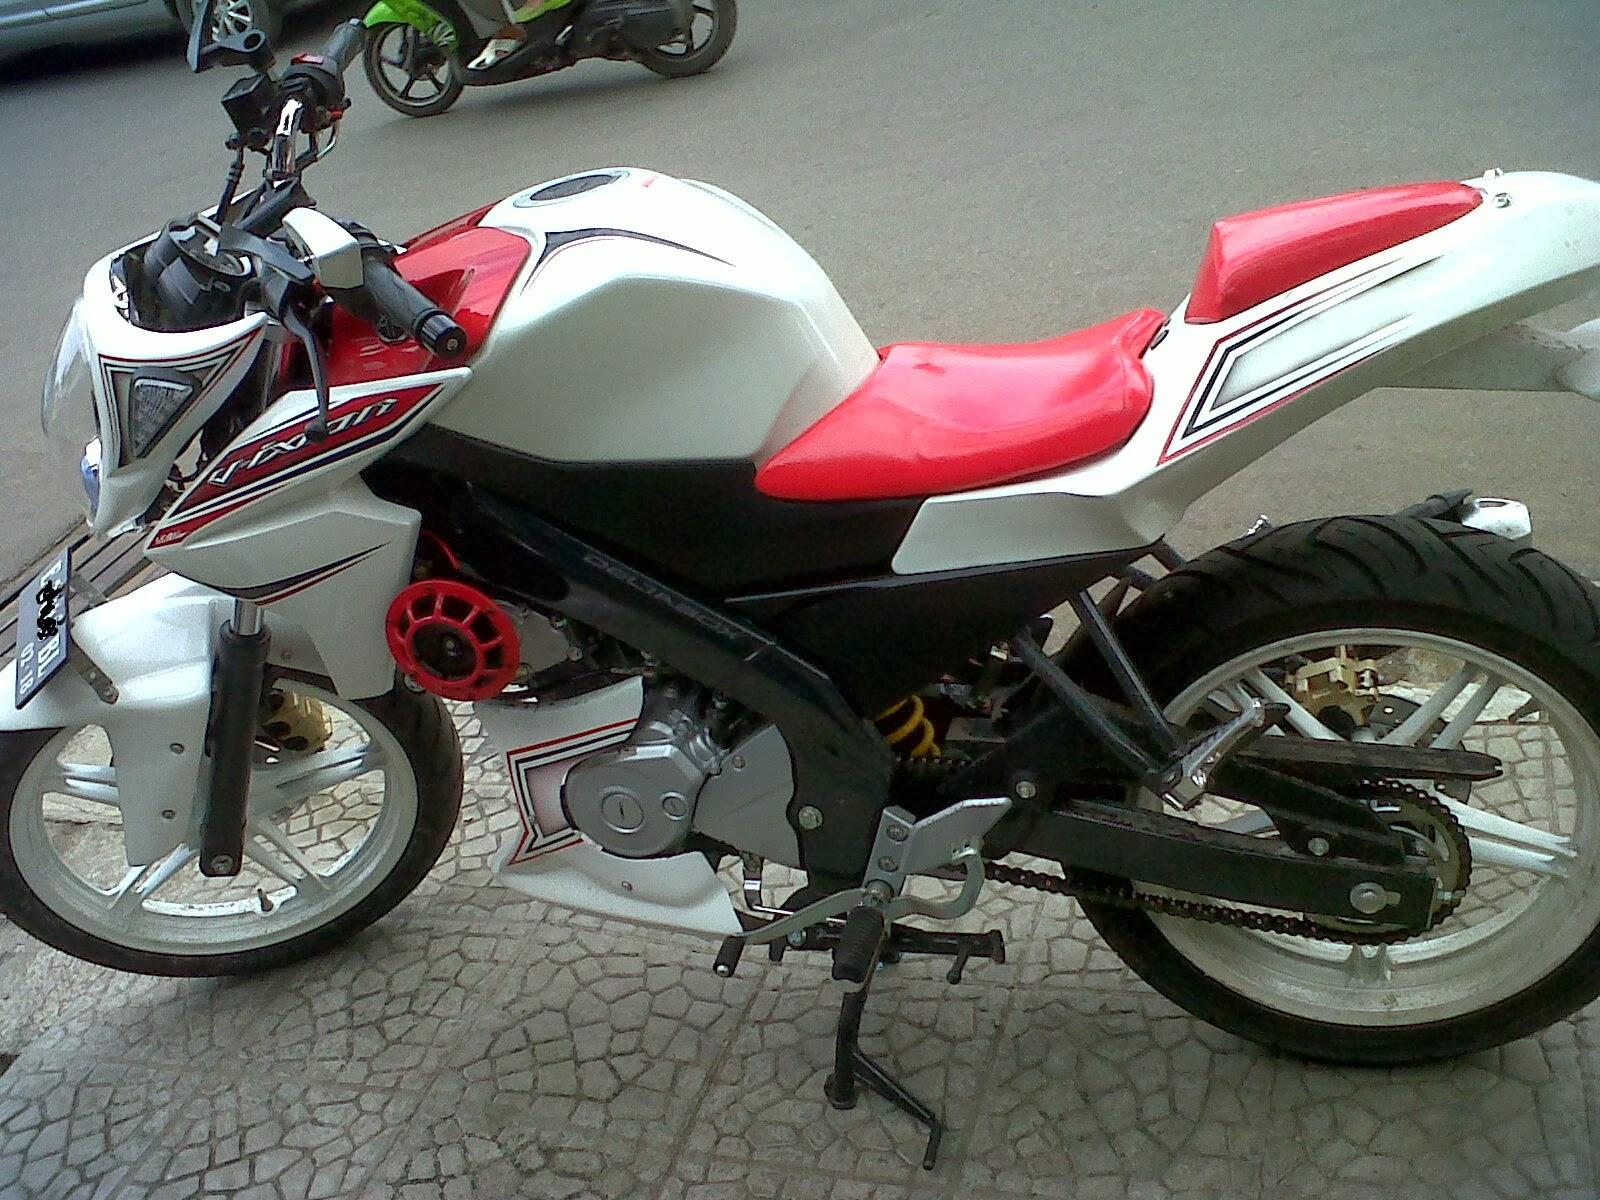 Download Kumpulan 97 Gambar Motor Yamaha Ss110 Terunik